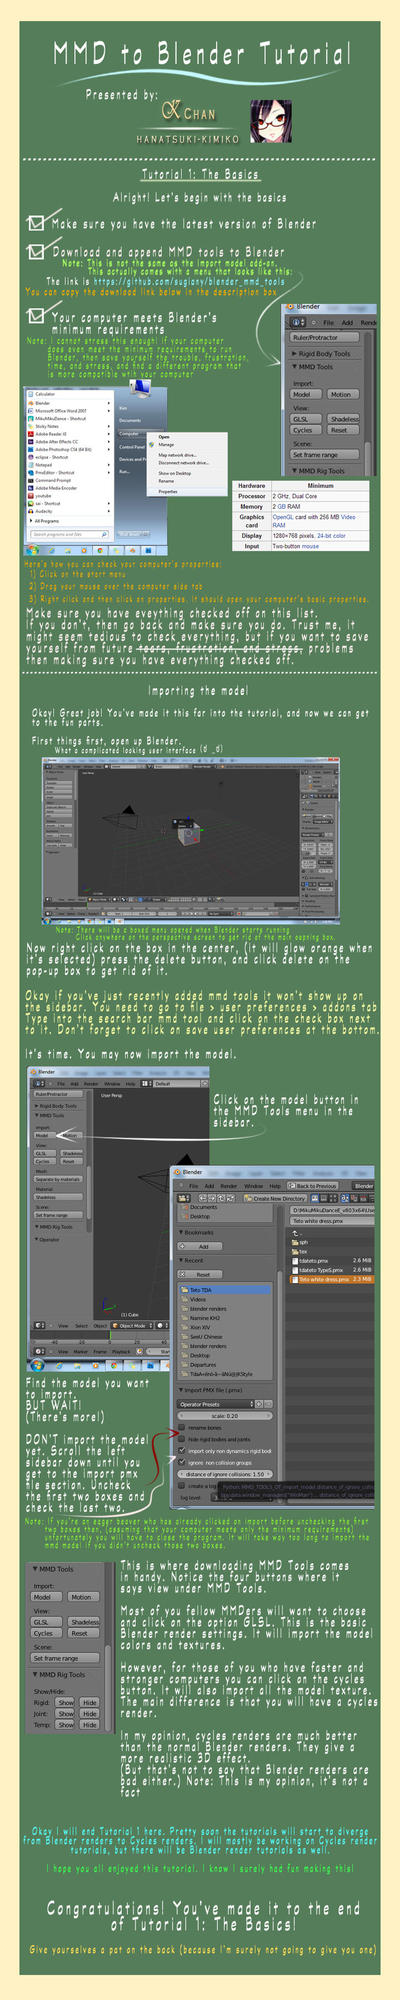 [MMD to Blender] Tutorial 1: The Basics by Hanatsuki-Kimiko